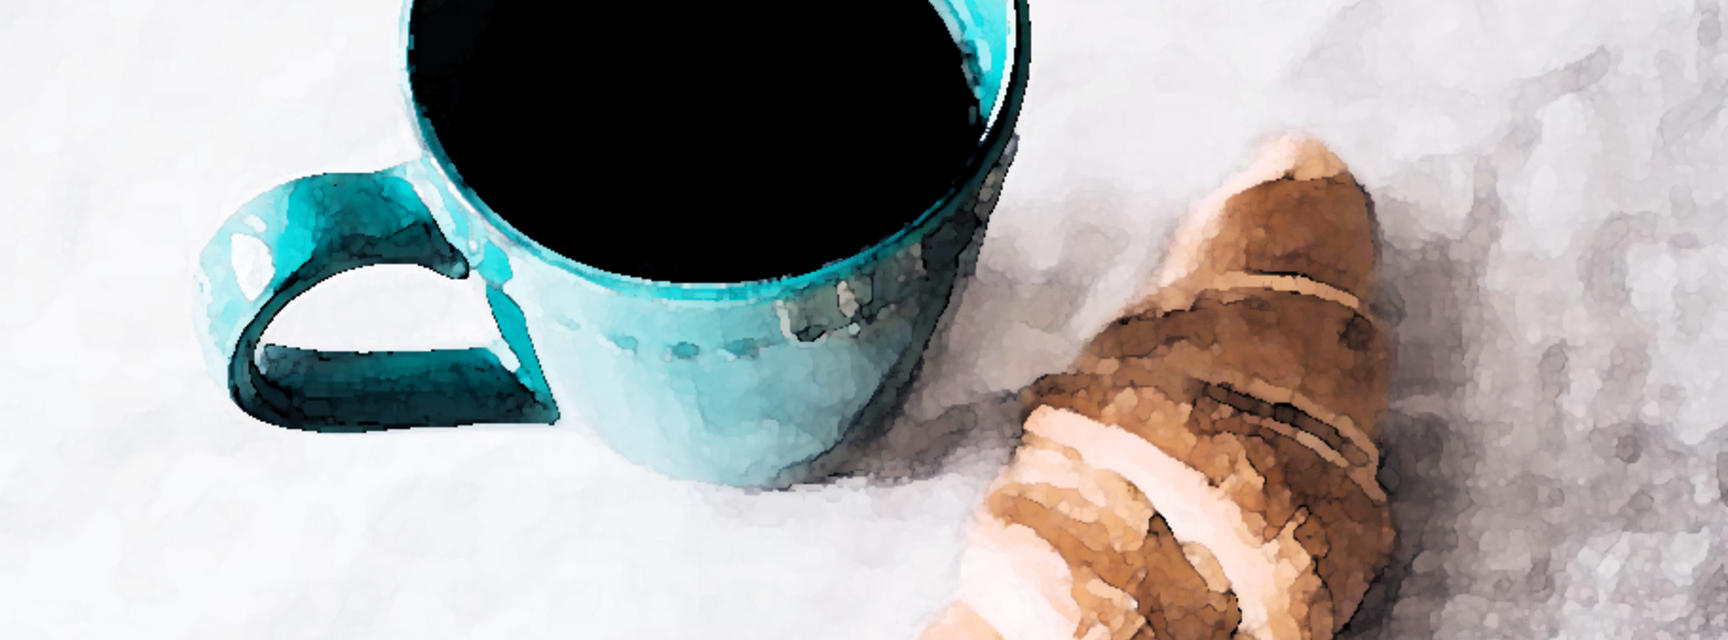 black coffee caffeine croissant cup